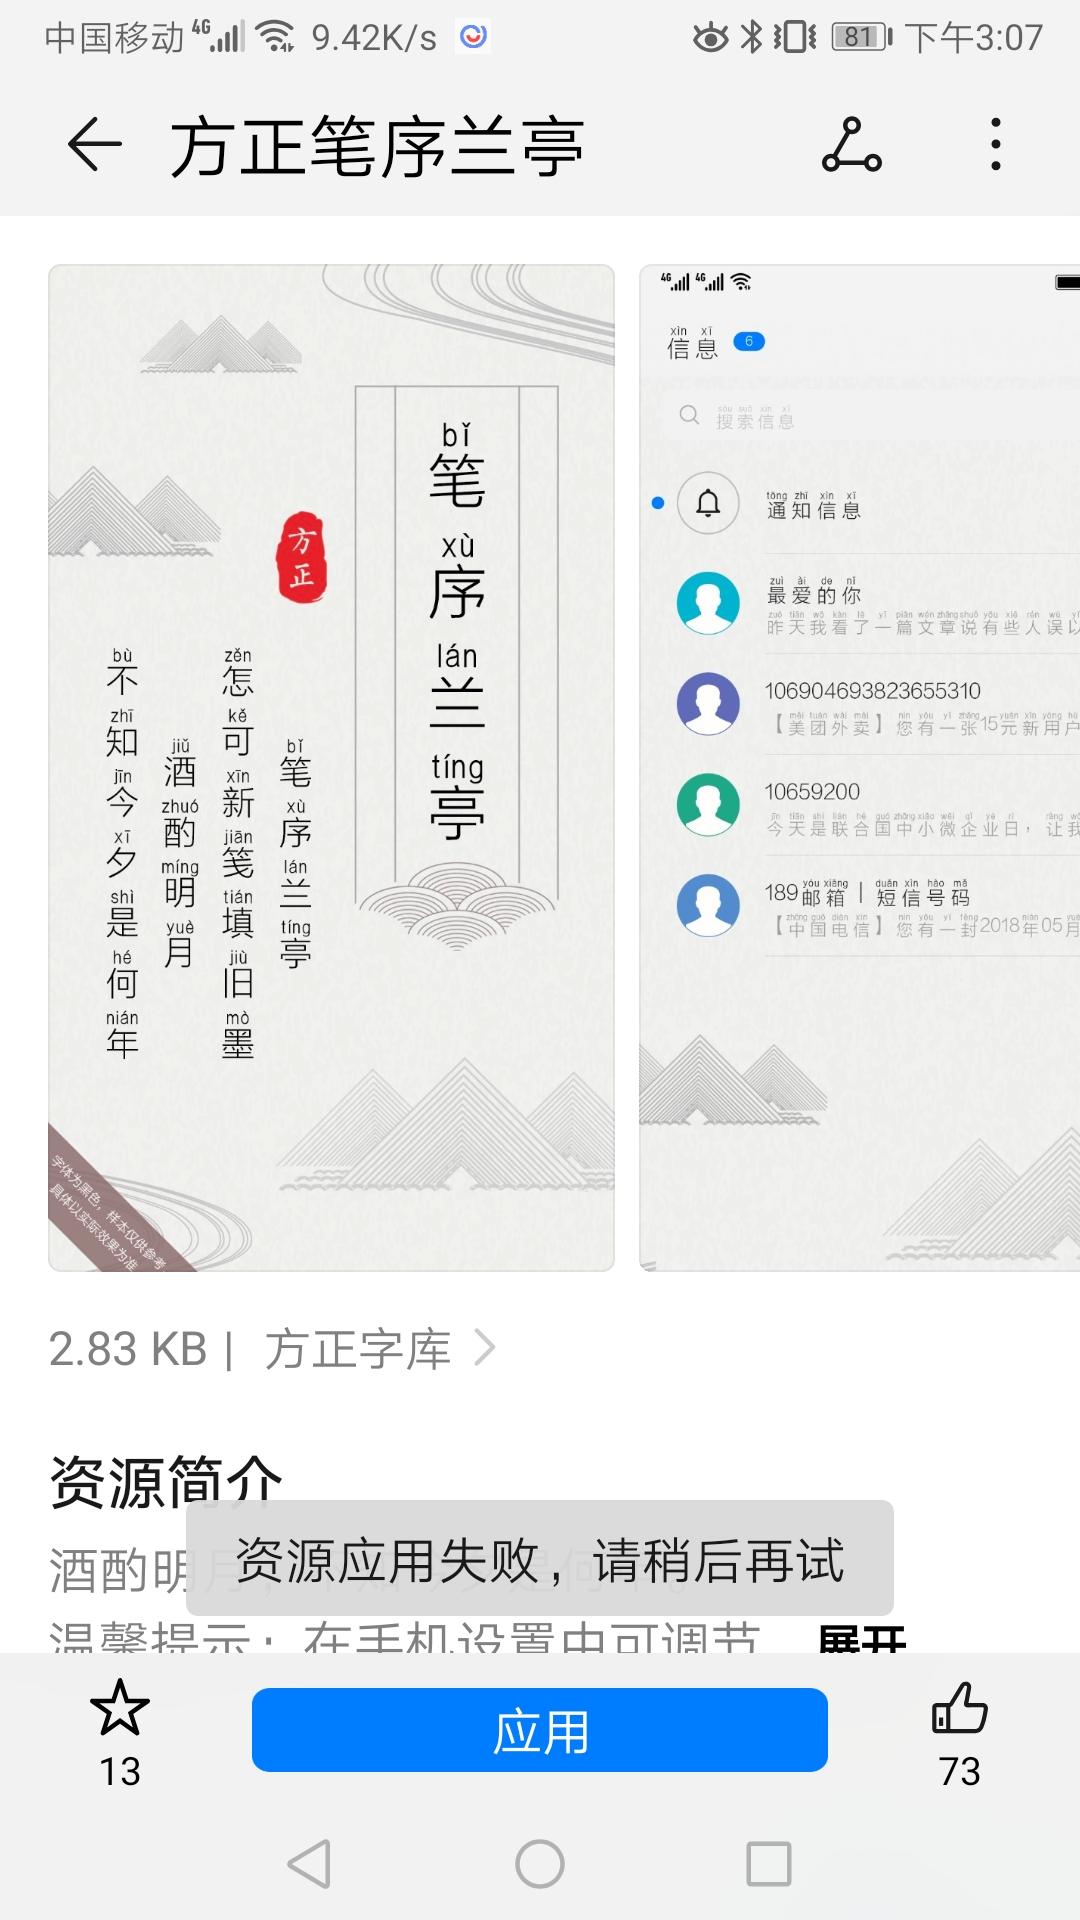 Screenshot_20190628_150724_com.huawei.android.thememanager.jpg